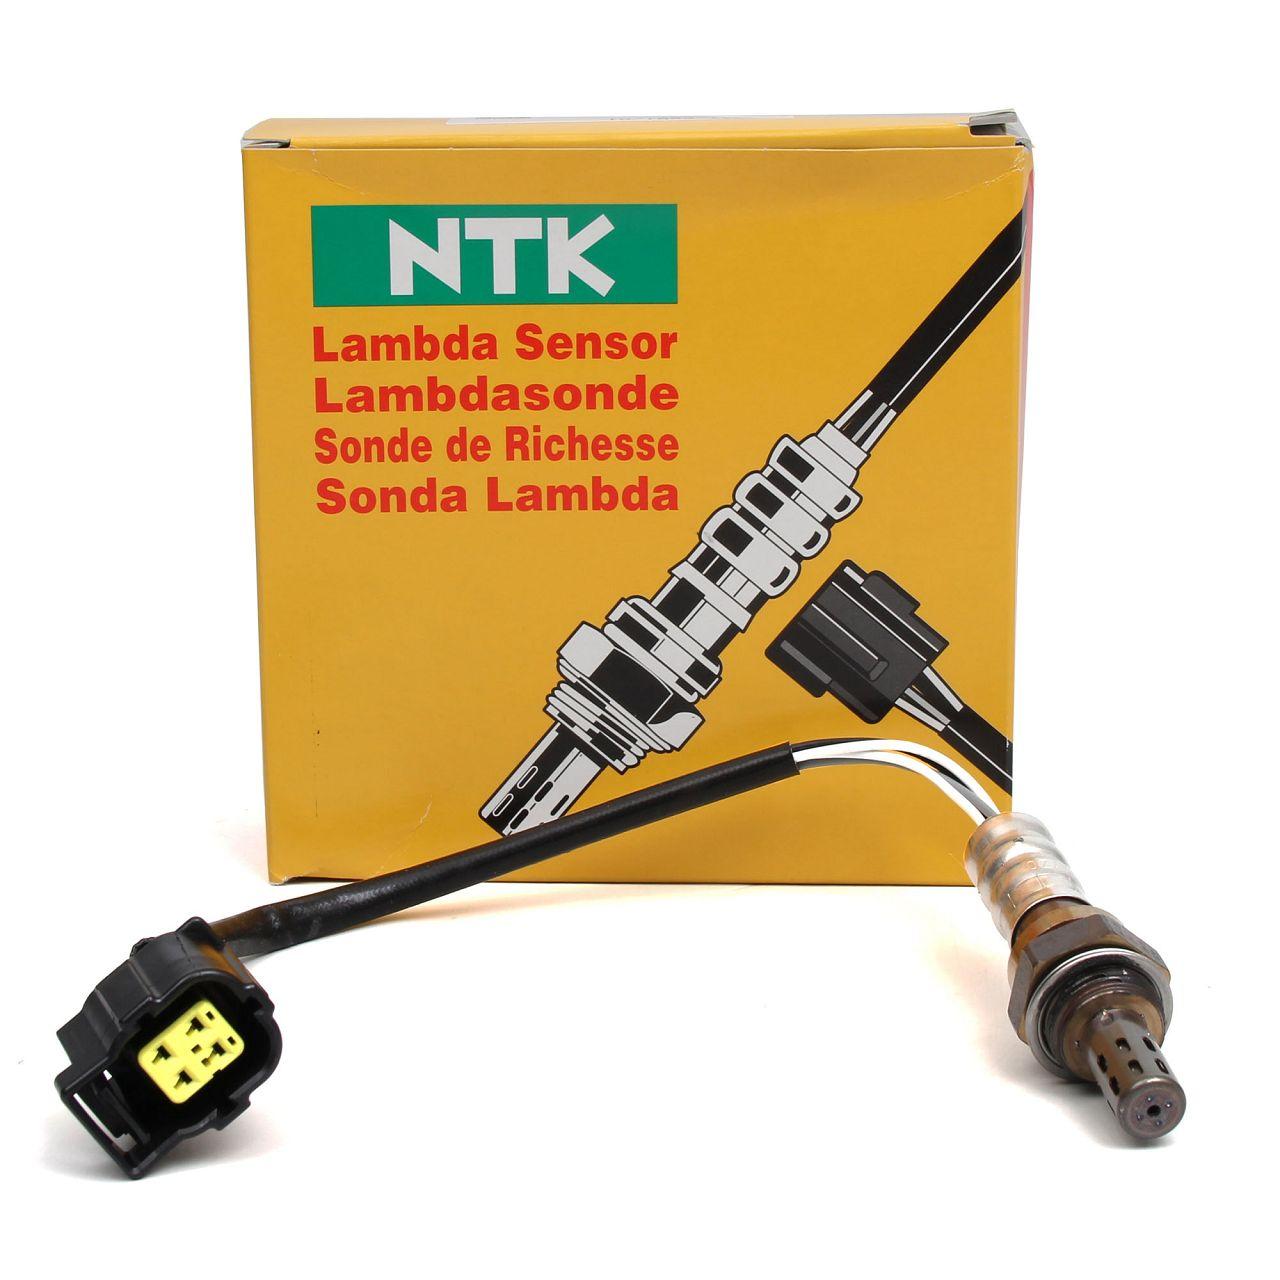 NGK 1709 Lambdasonde Regelsonde VOR Kat für SMART FORTWO (451) 1.0 61/71/84 PS